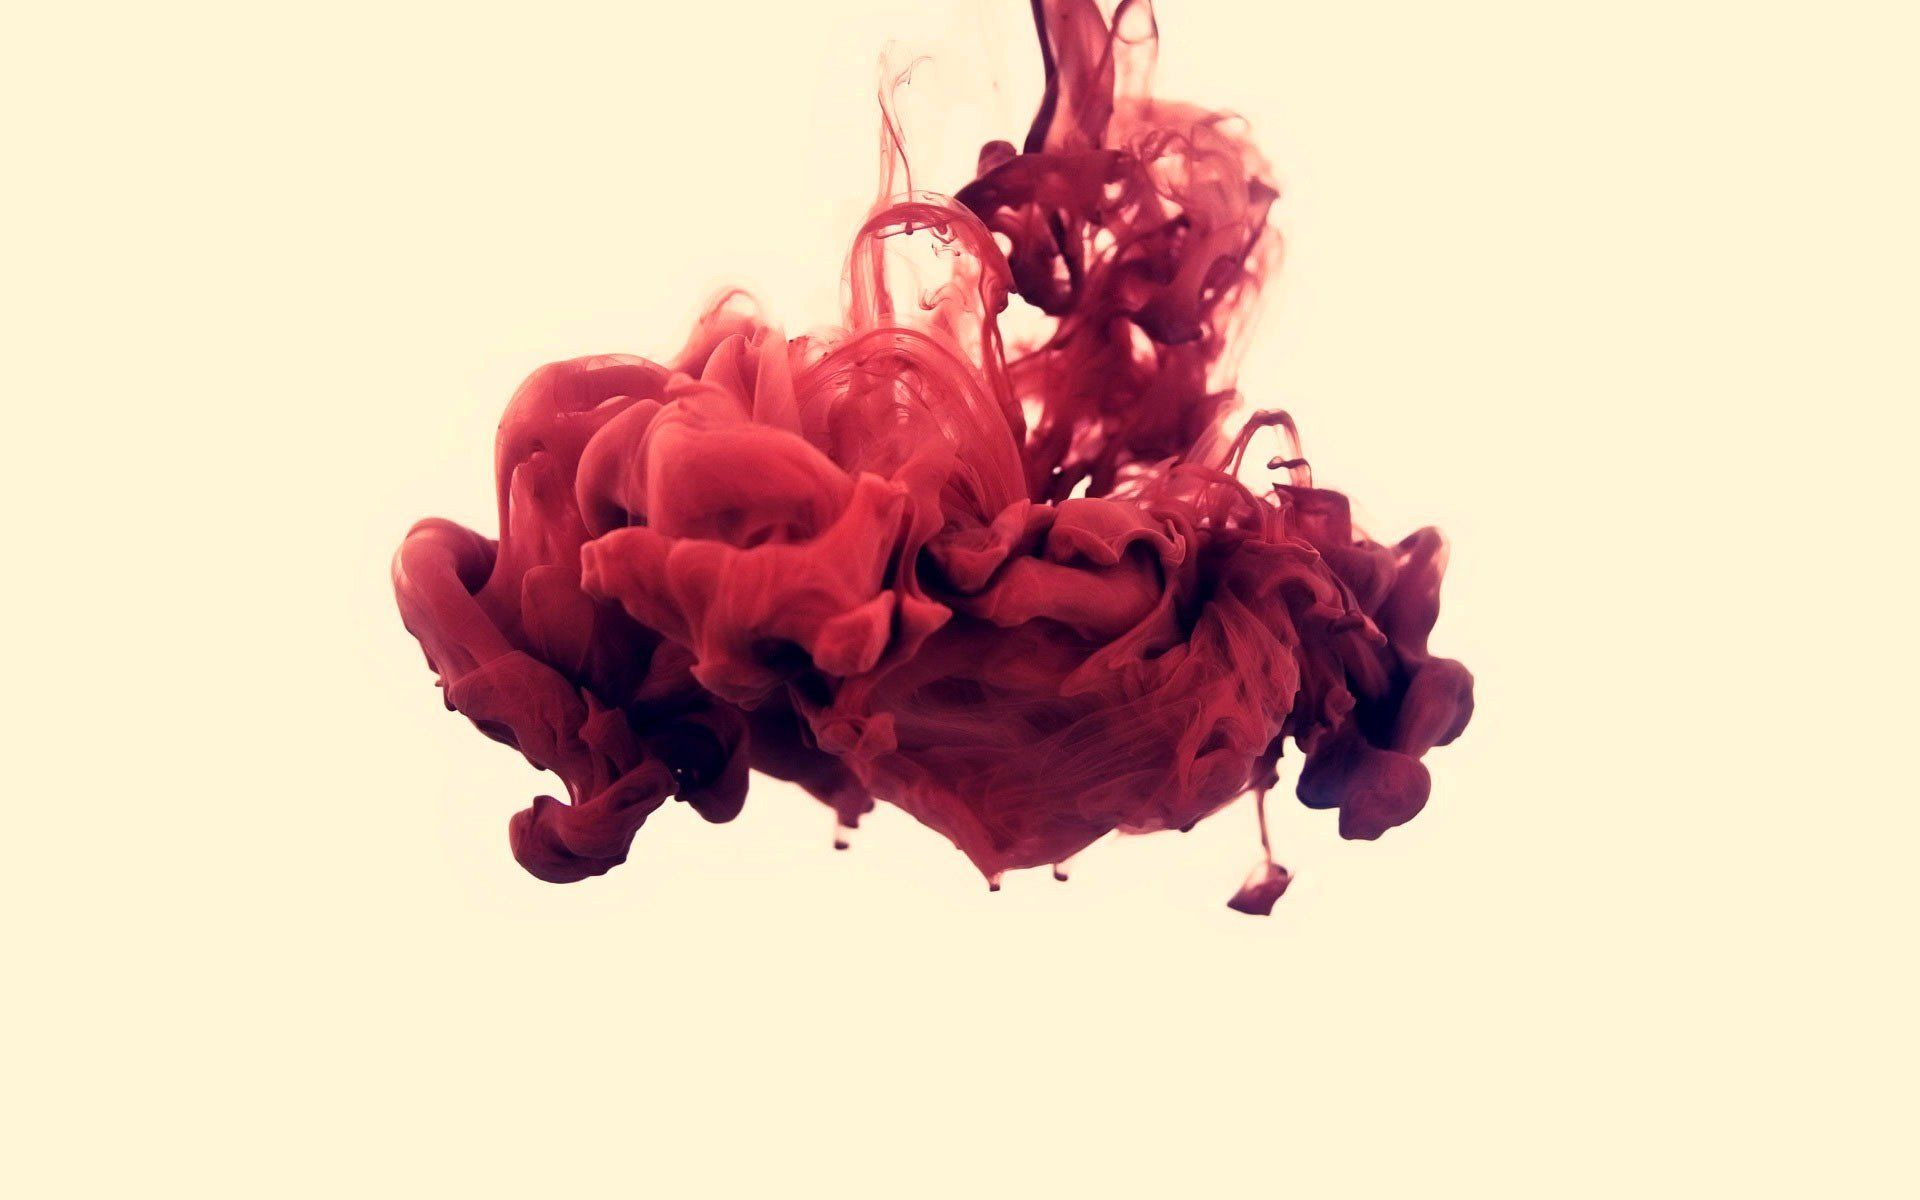 Red Liquid Wallpaper HD